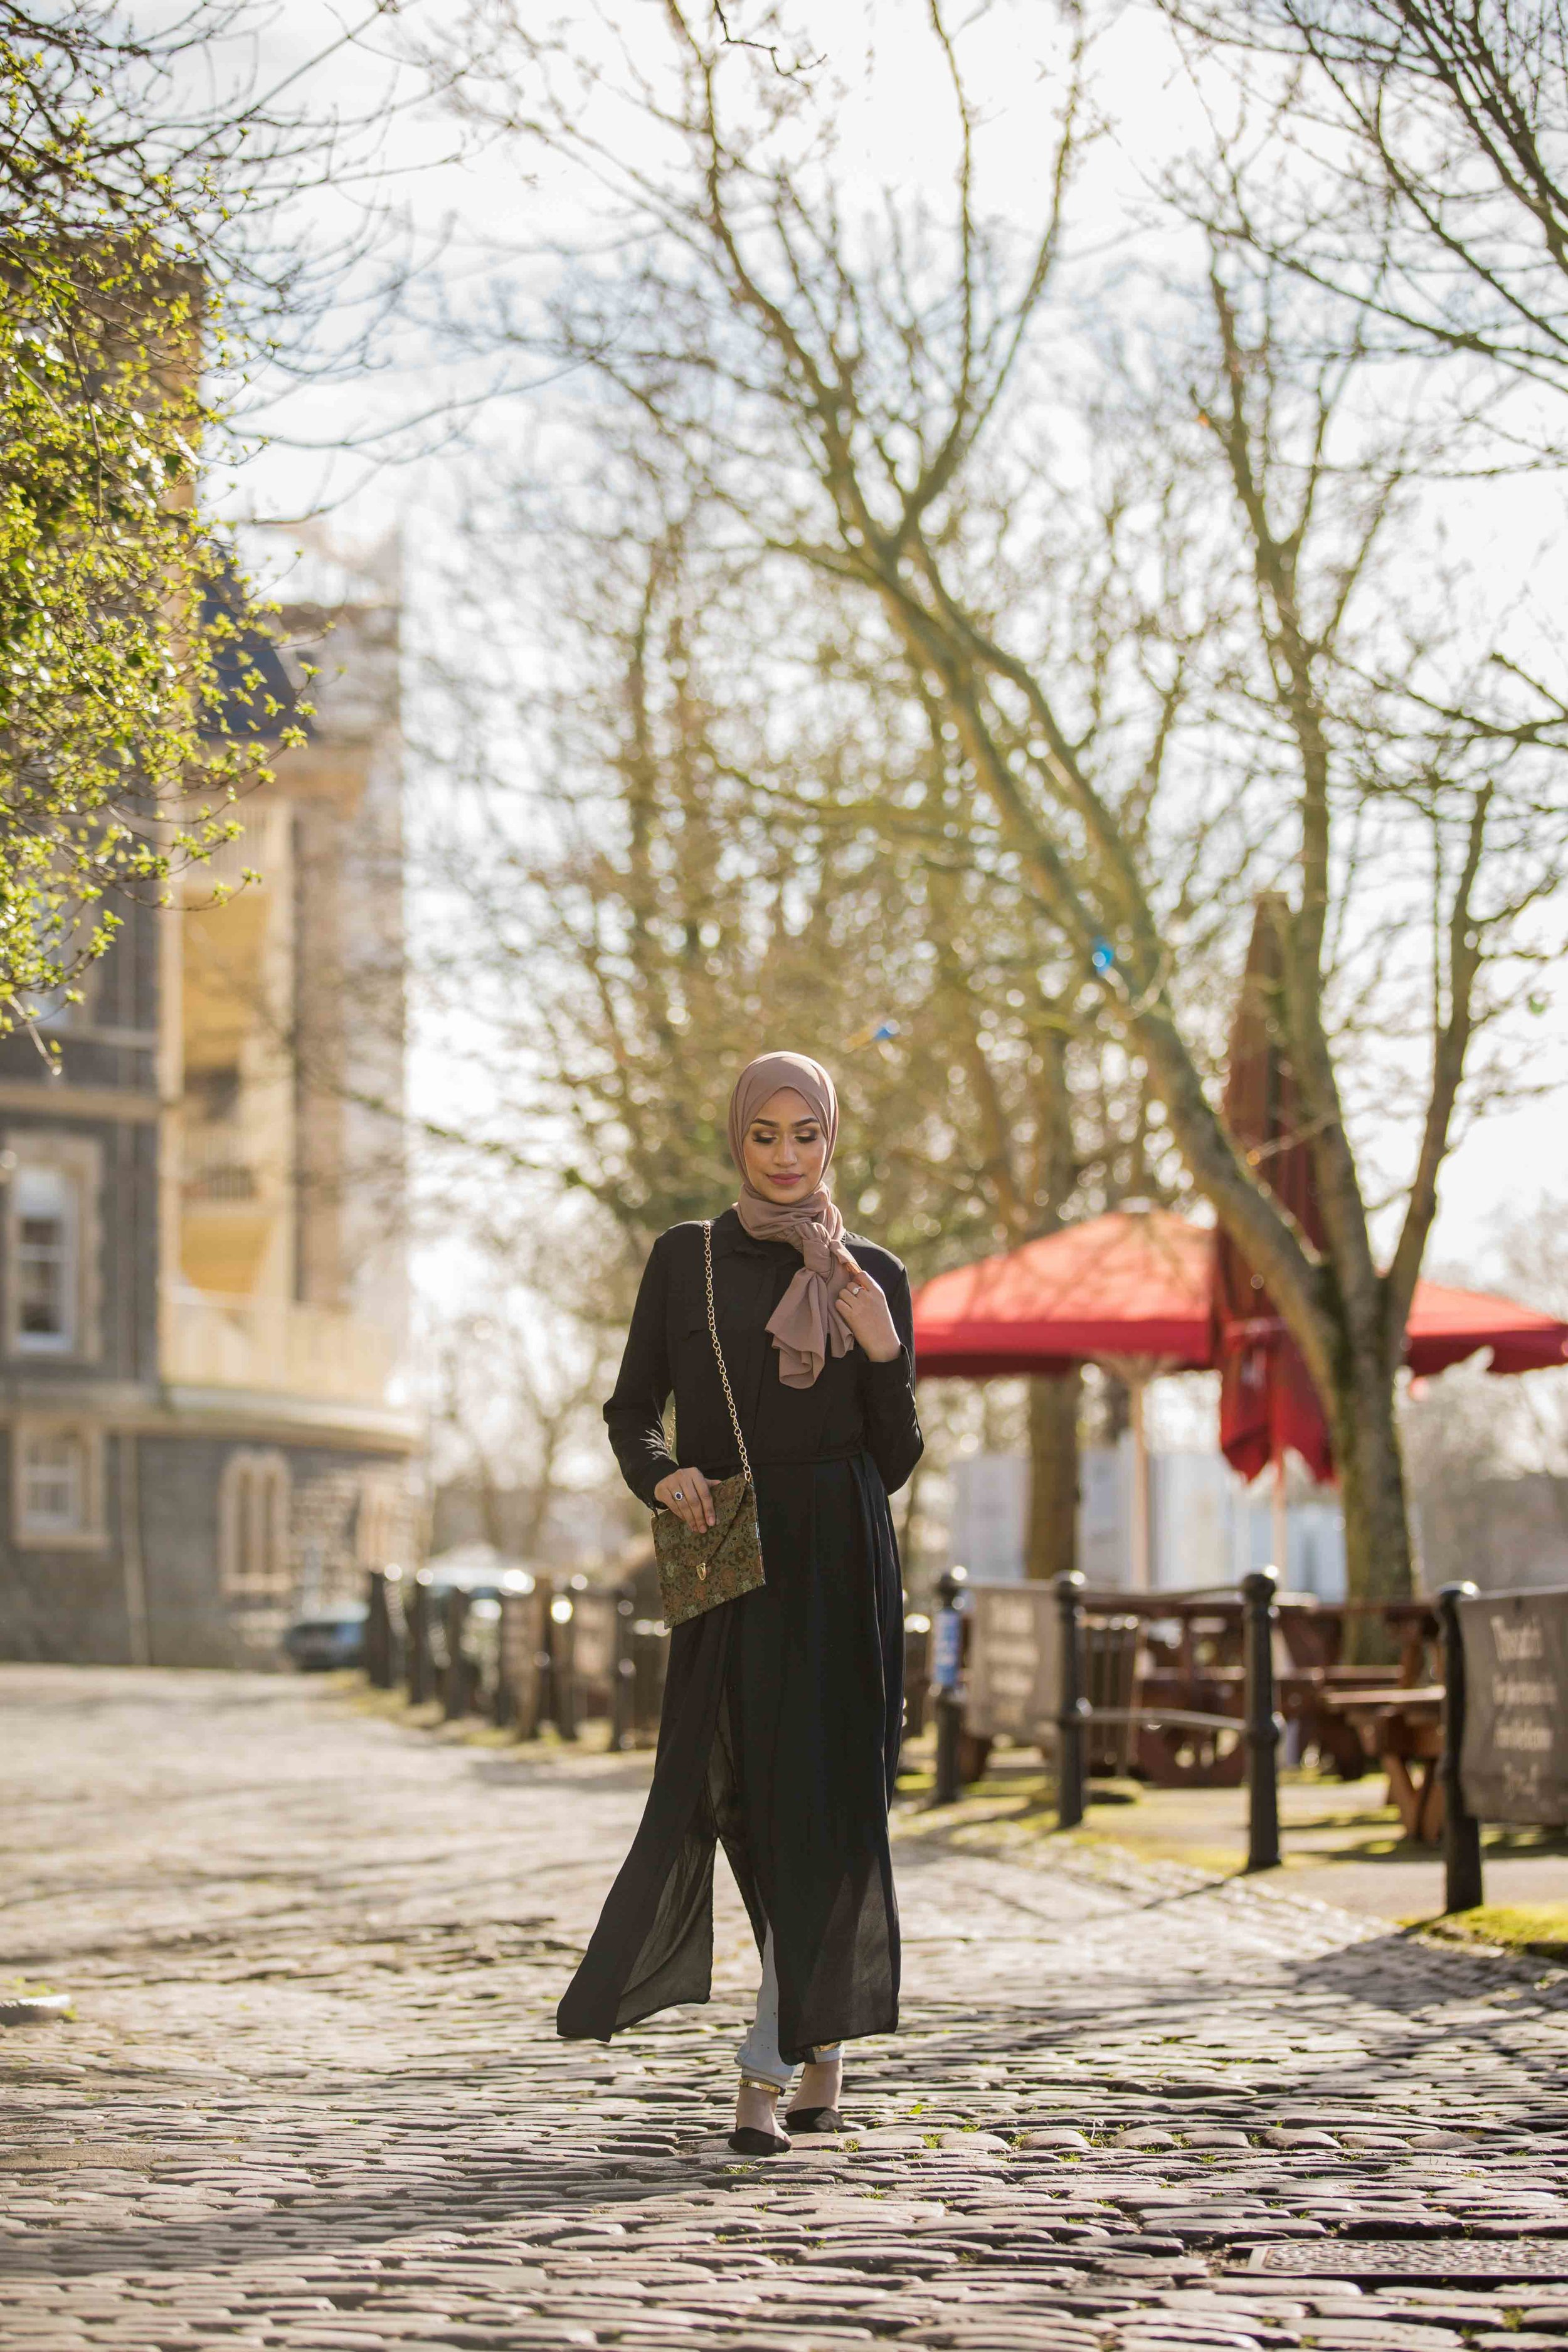 modest-street-aisha-rahman-fashion-photography-london-bristol-natalia-smith-photography-abaya-9.jpg